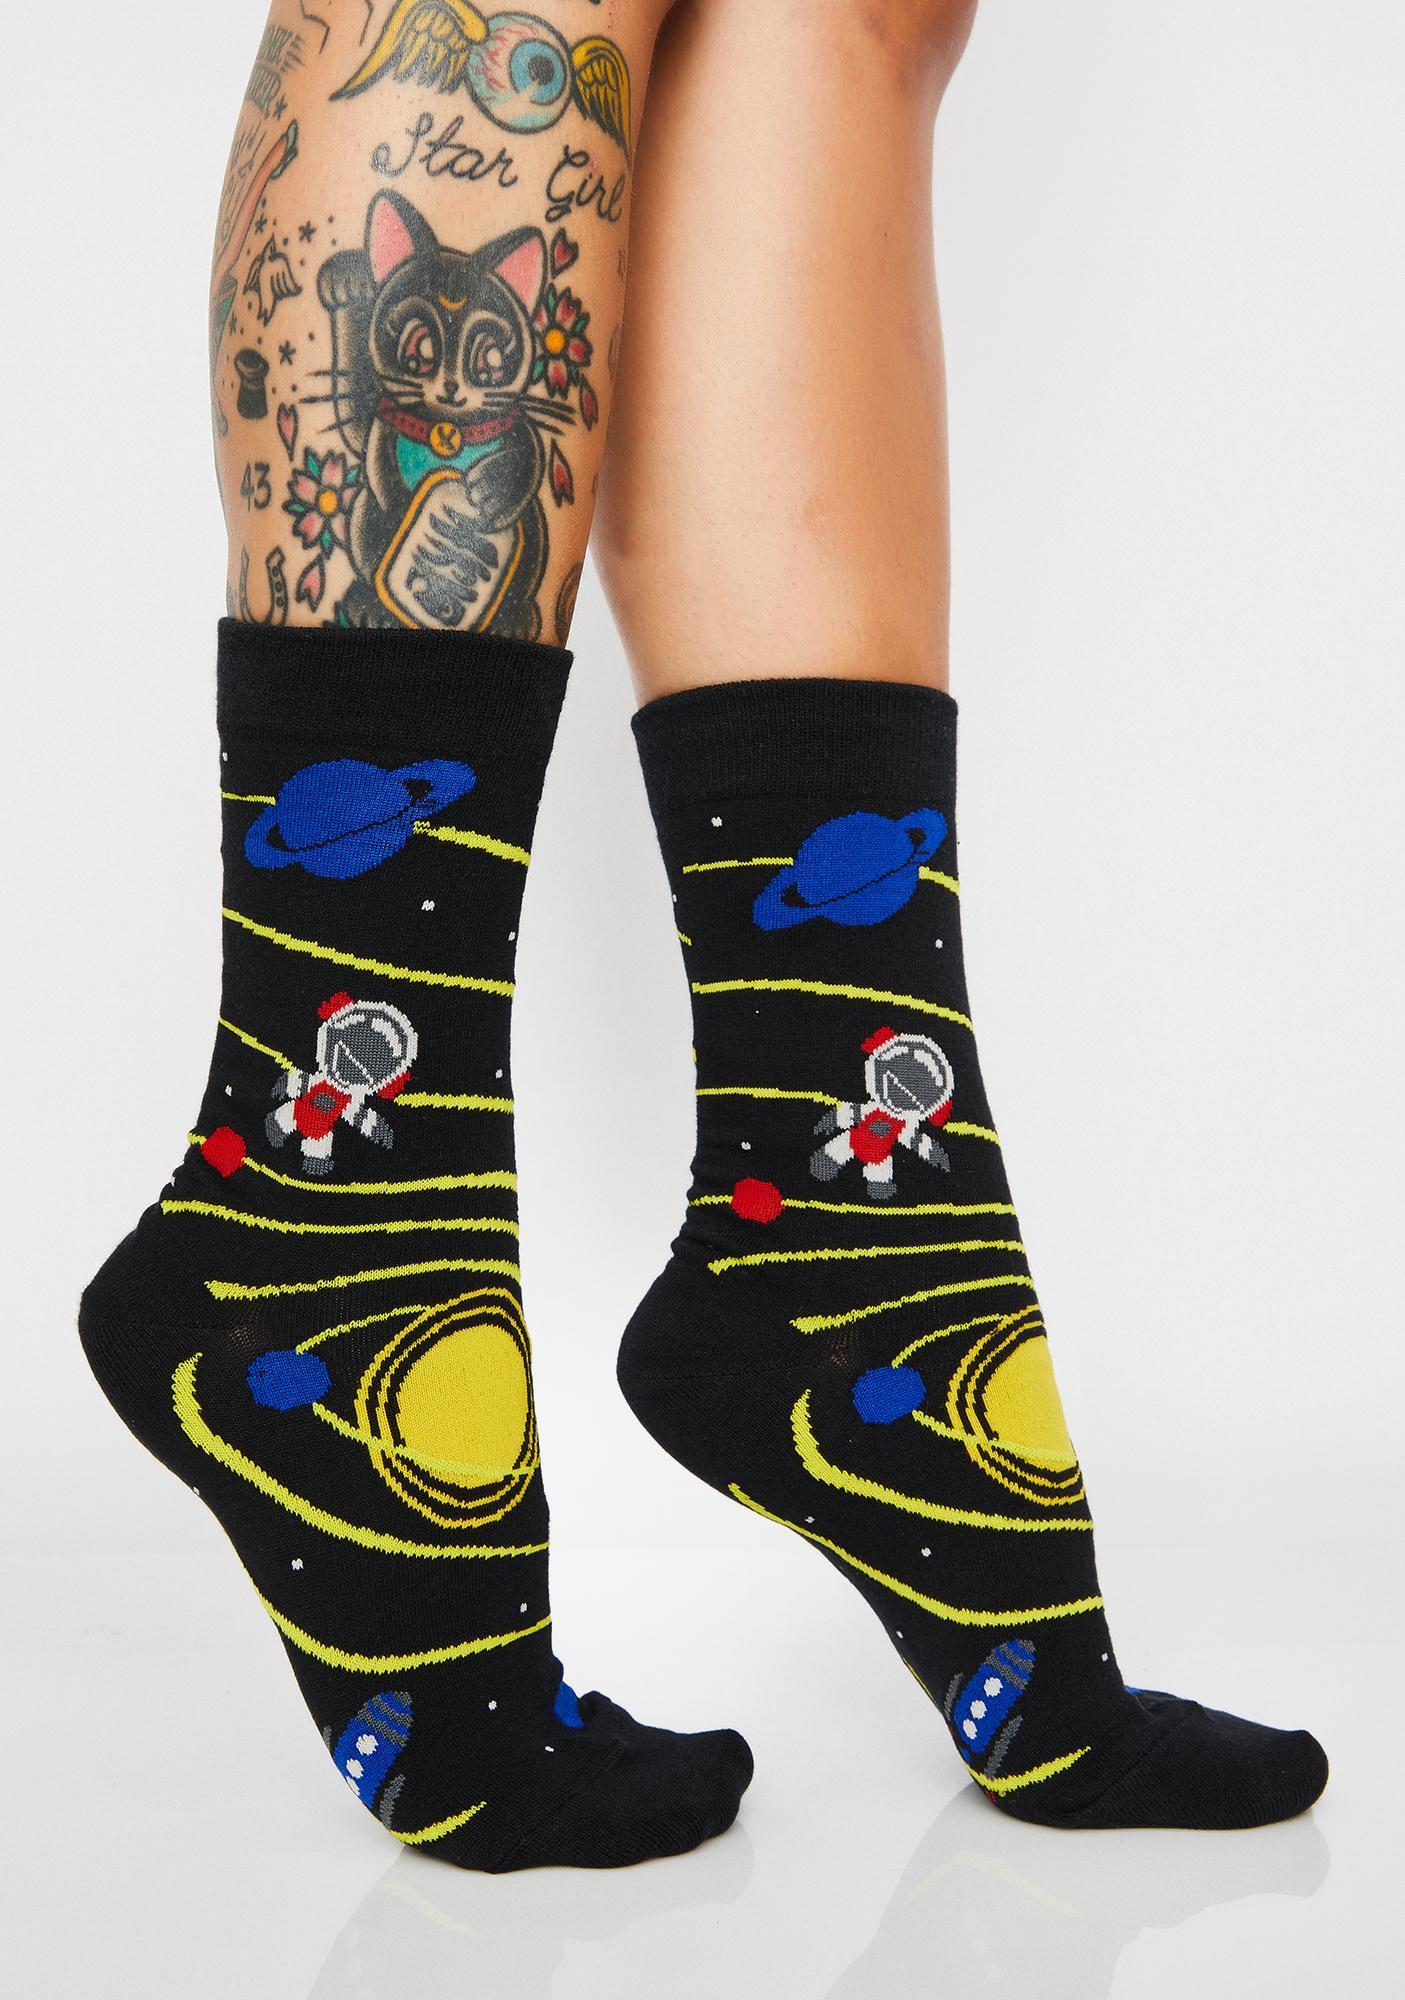 Lost In The Galaxy Socks